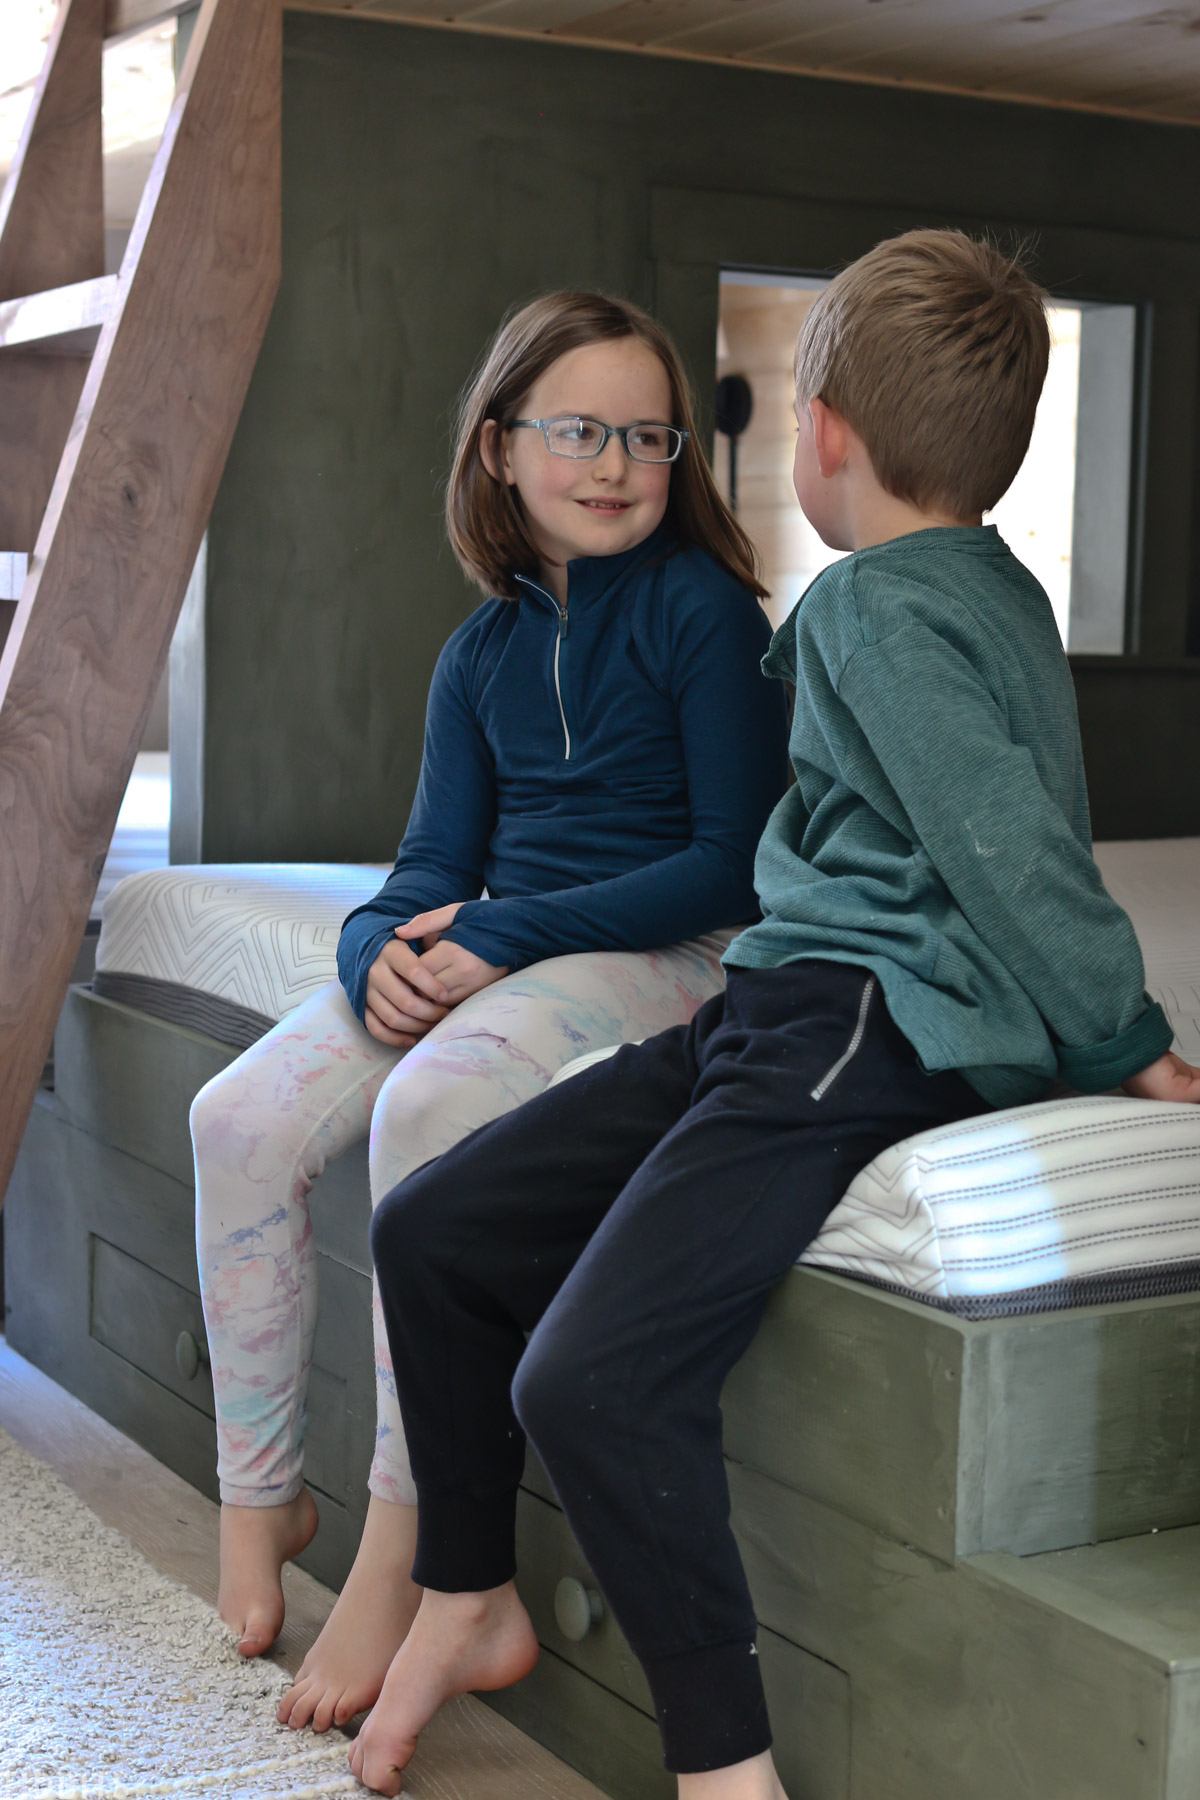 two children sitting on a kids platform bed with a memory foam mattress made by Mattress Firm